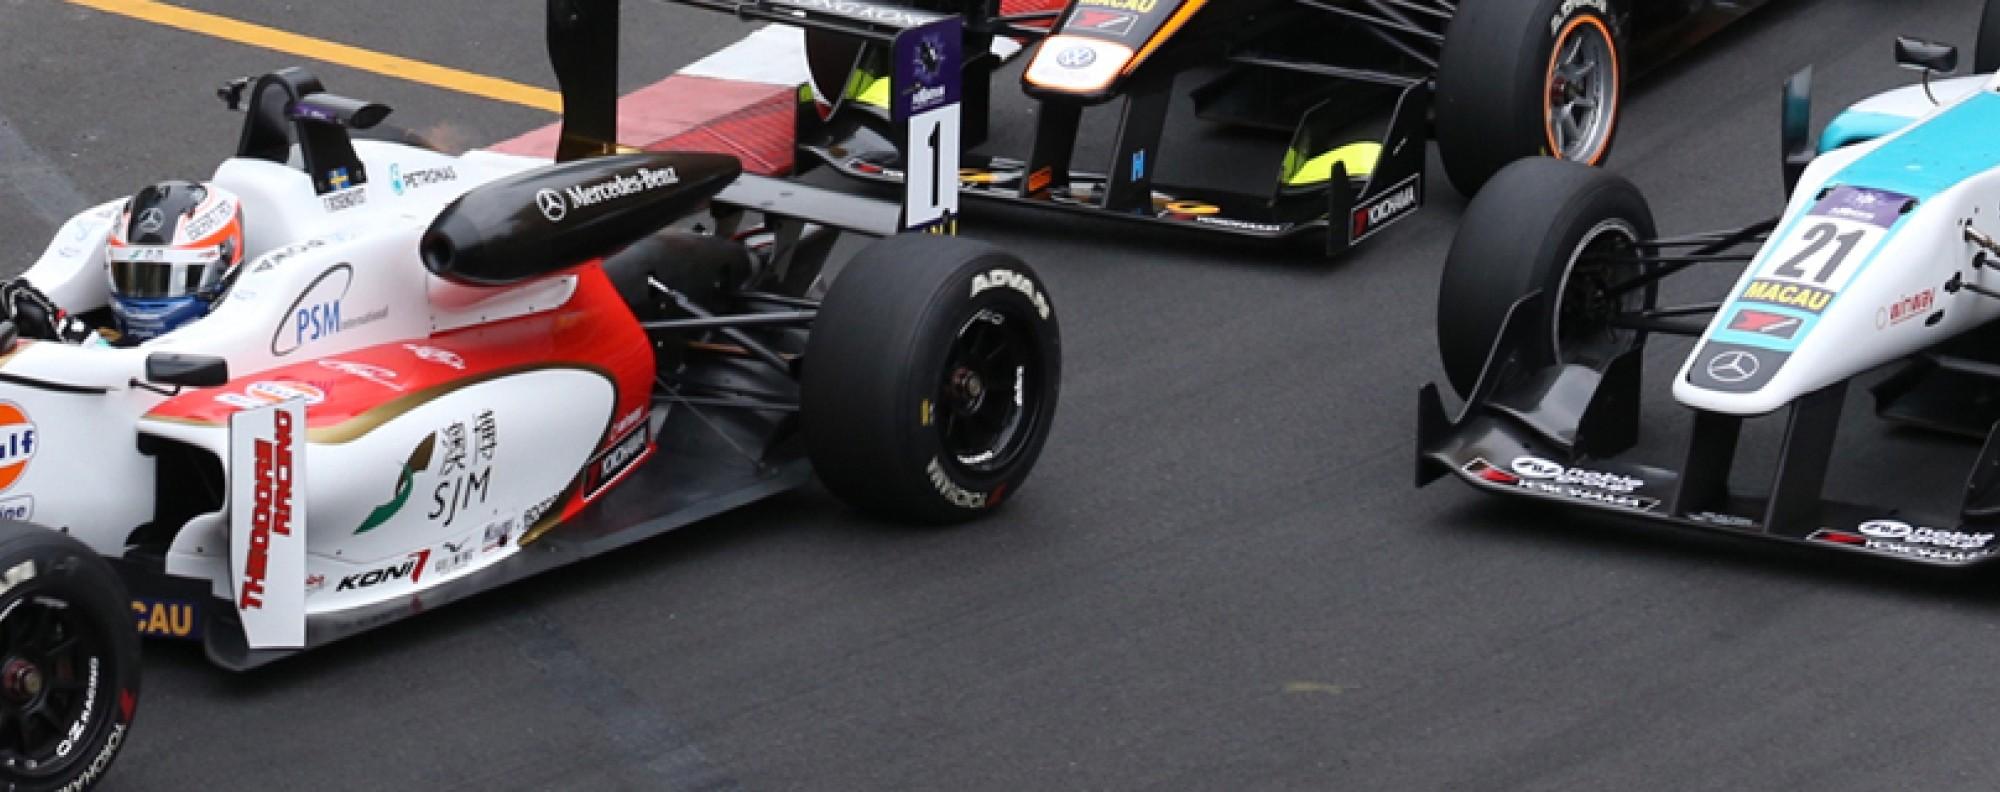 Macau Grand Prix 2017 >> Macau Grand Prix South China Morning Post